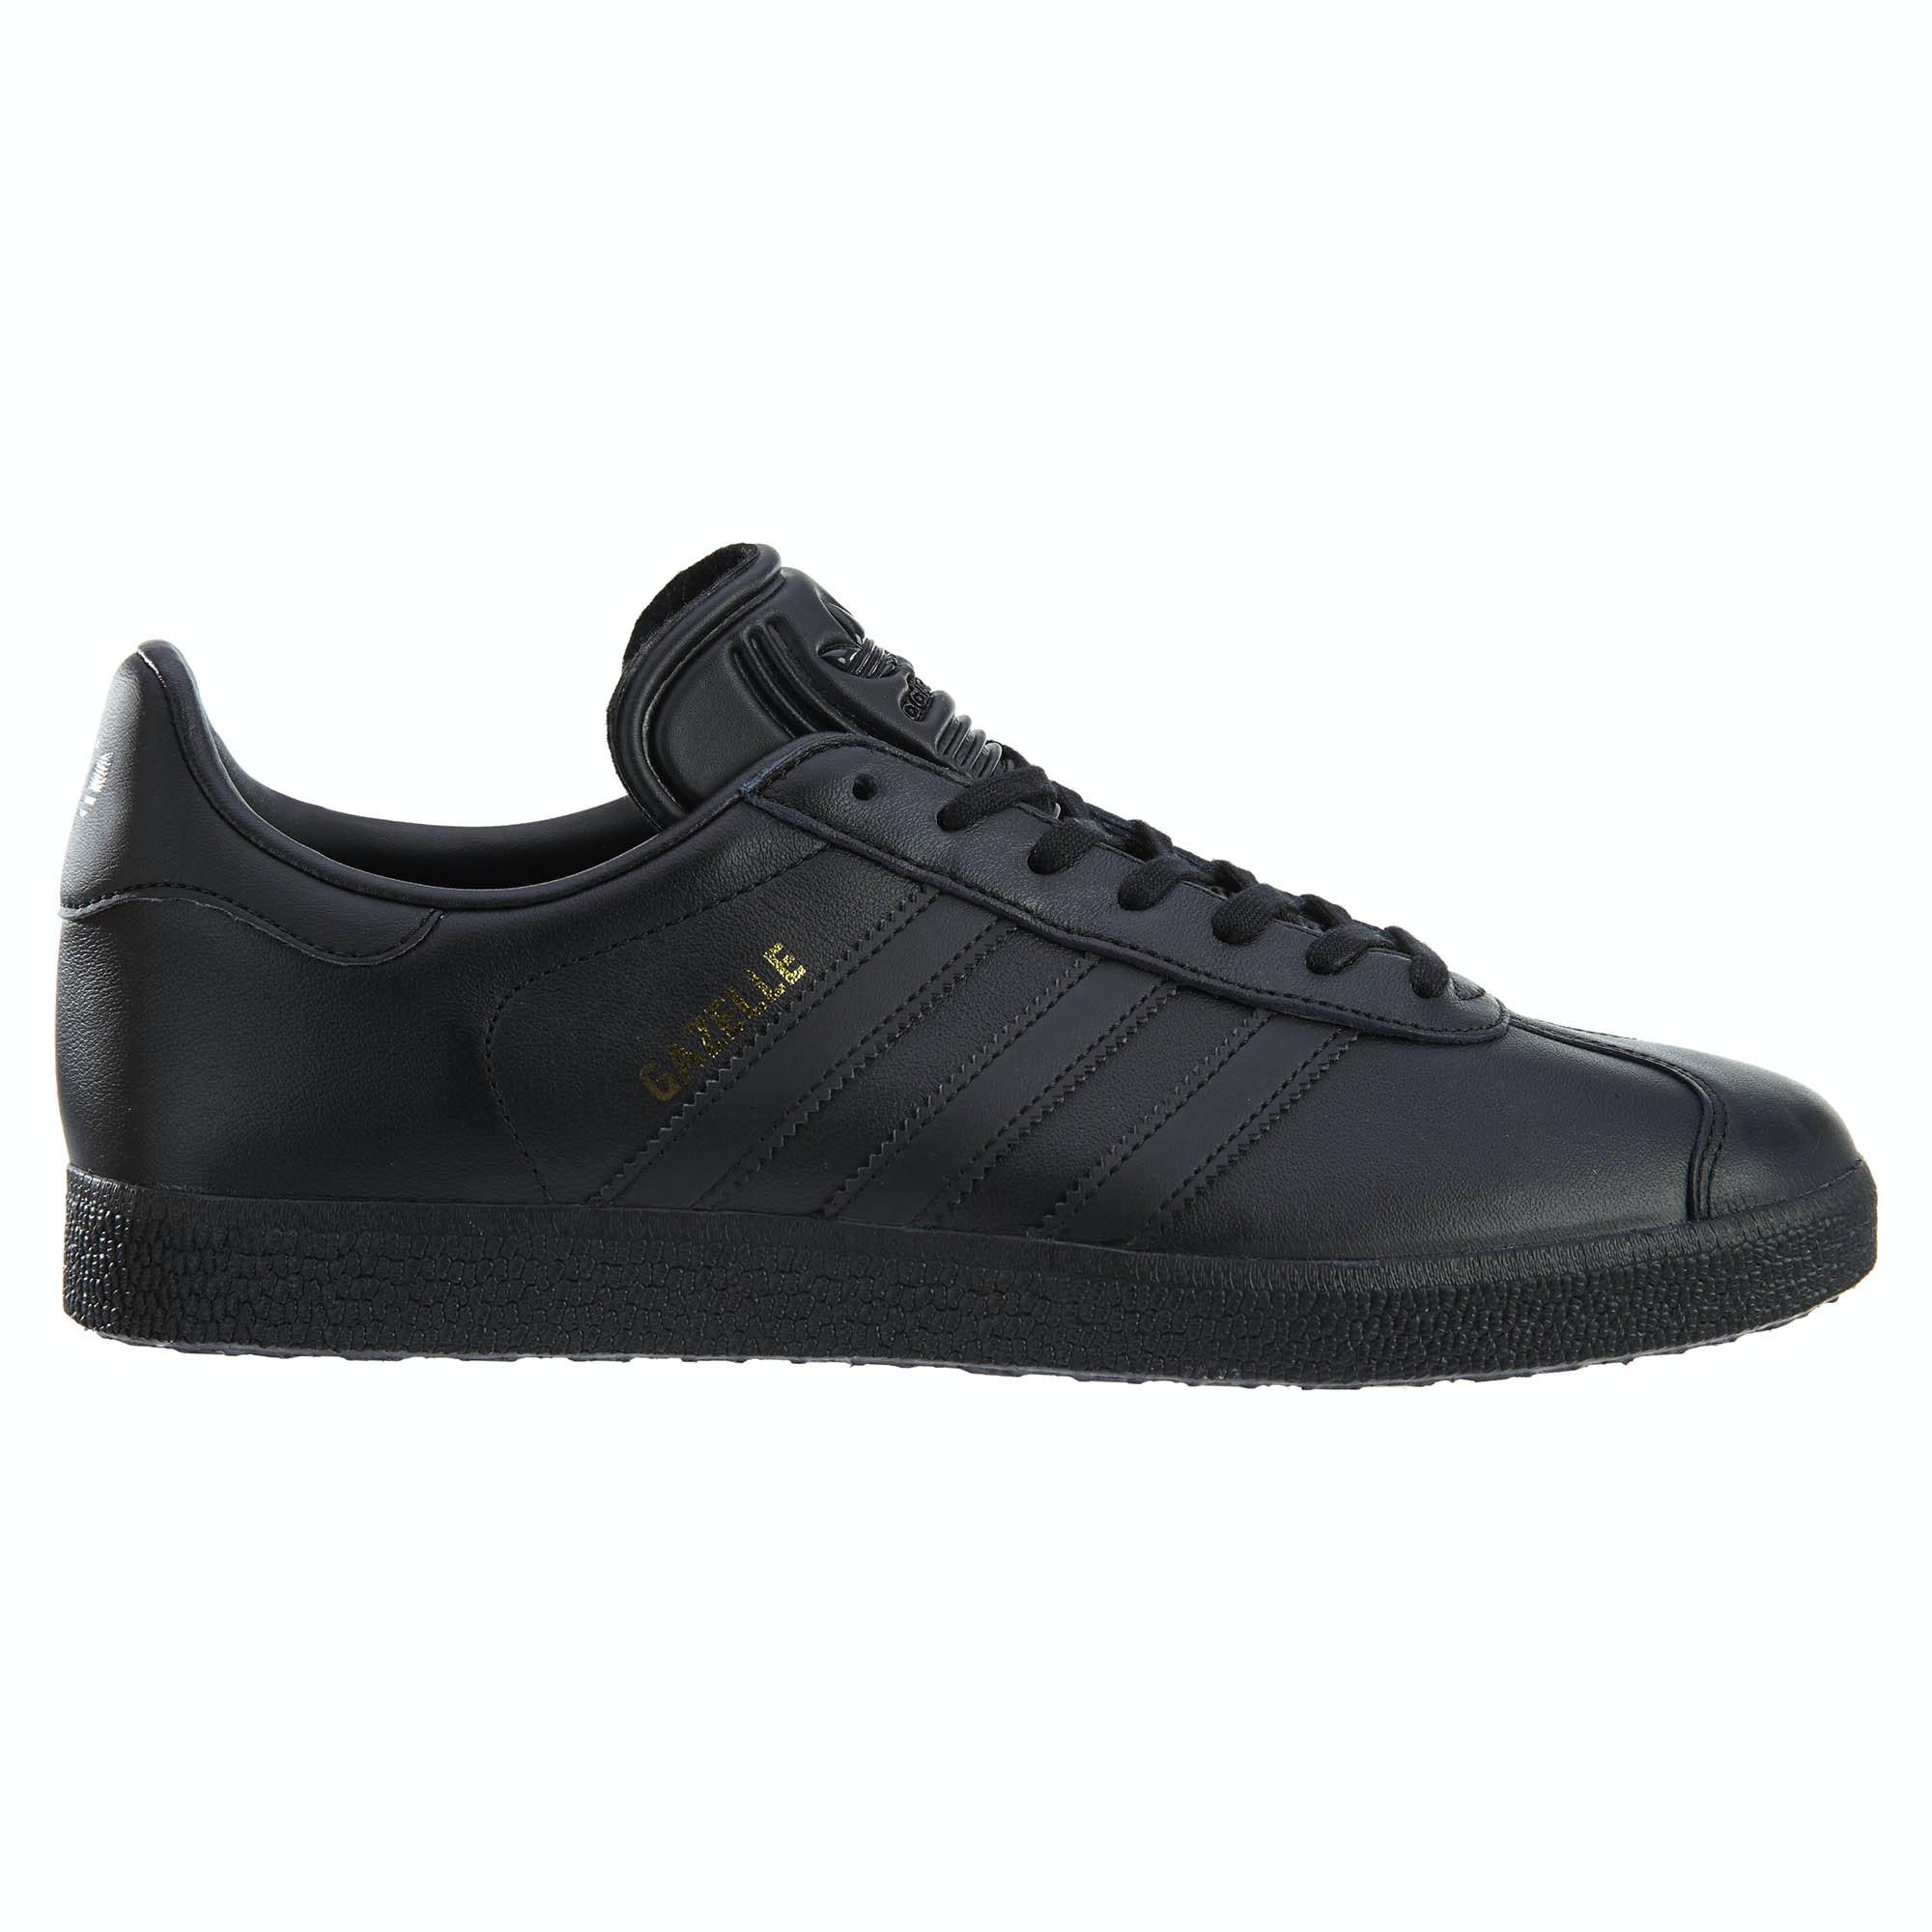 adidas Gazelle Black/Black-Gold Metallic